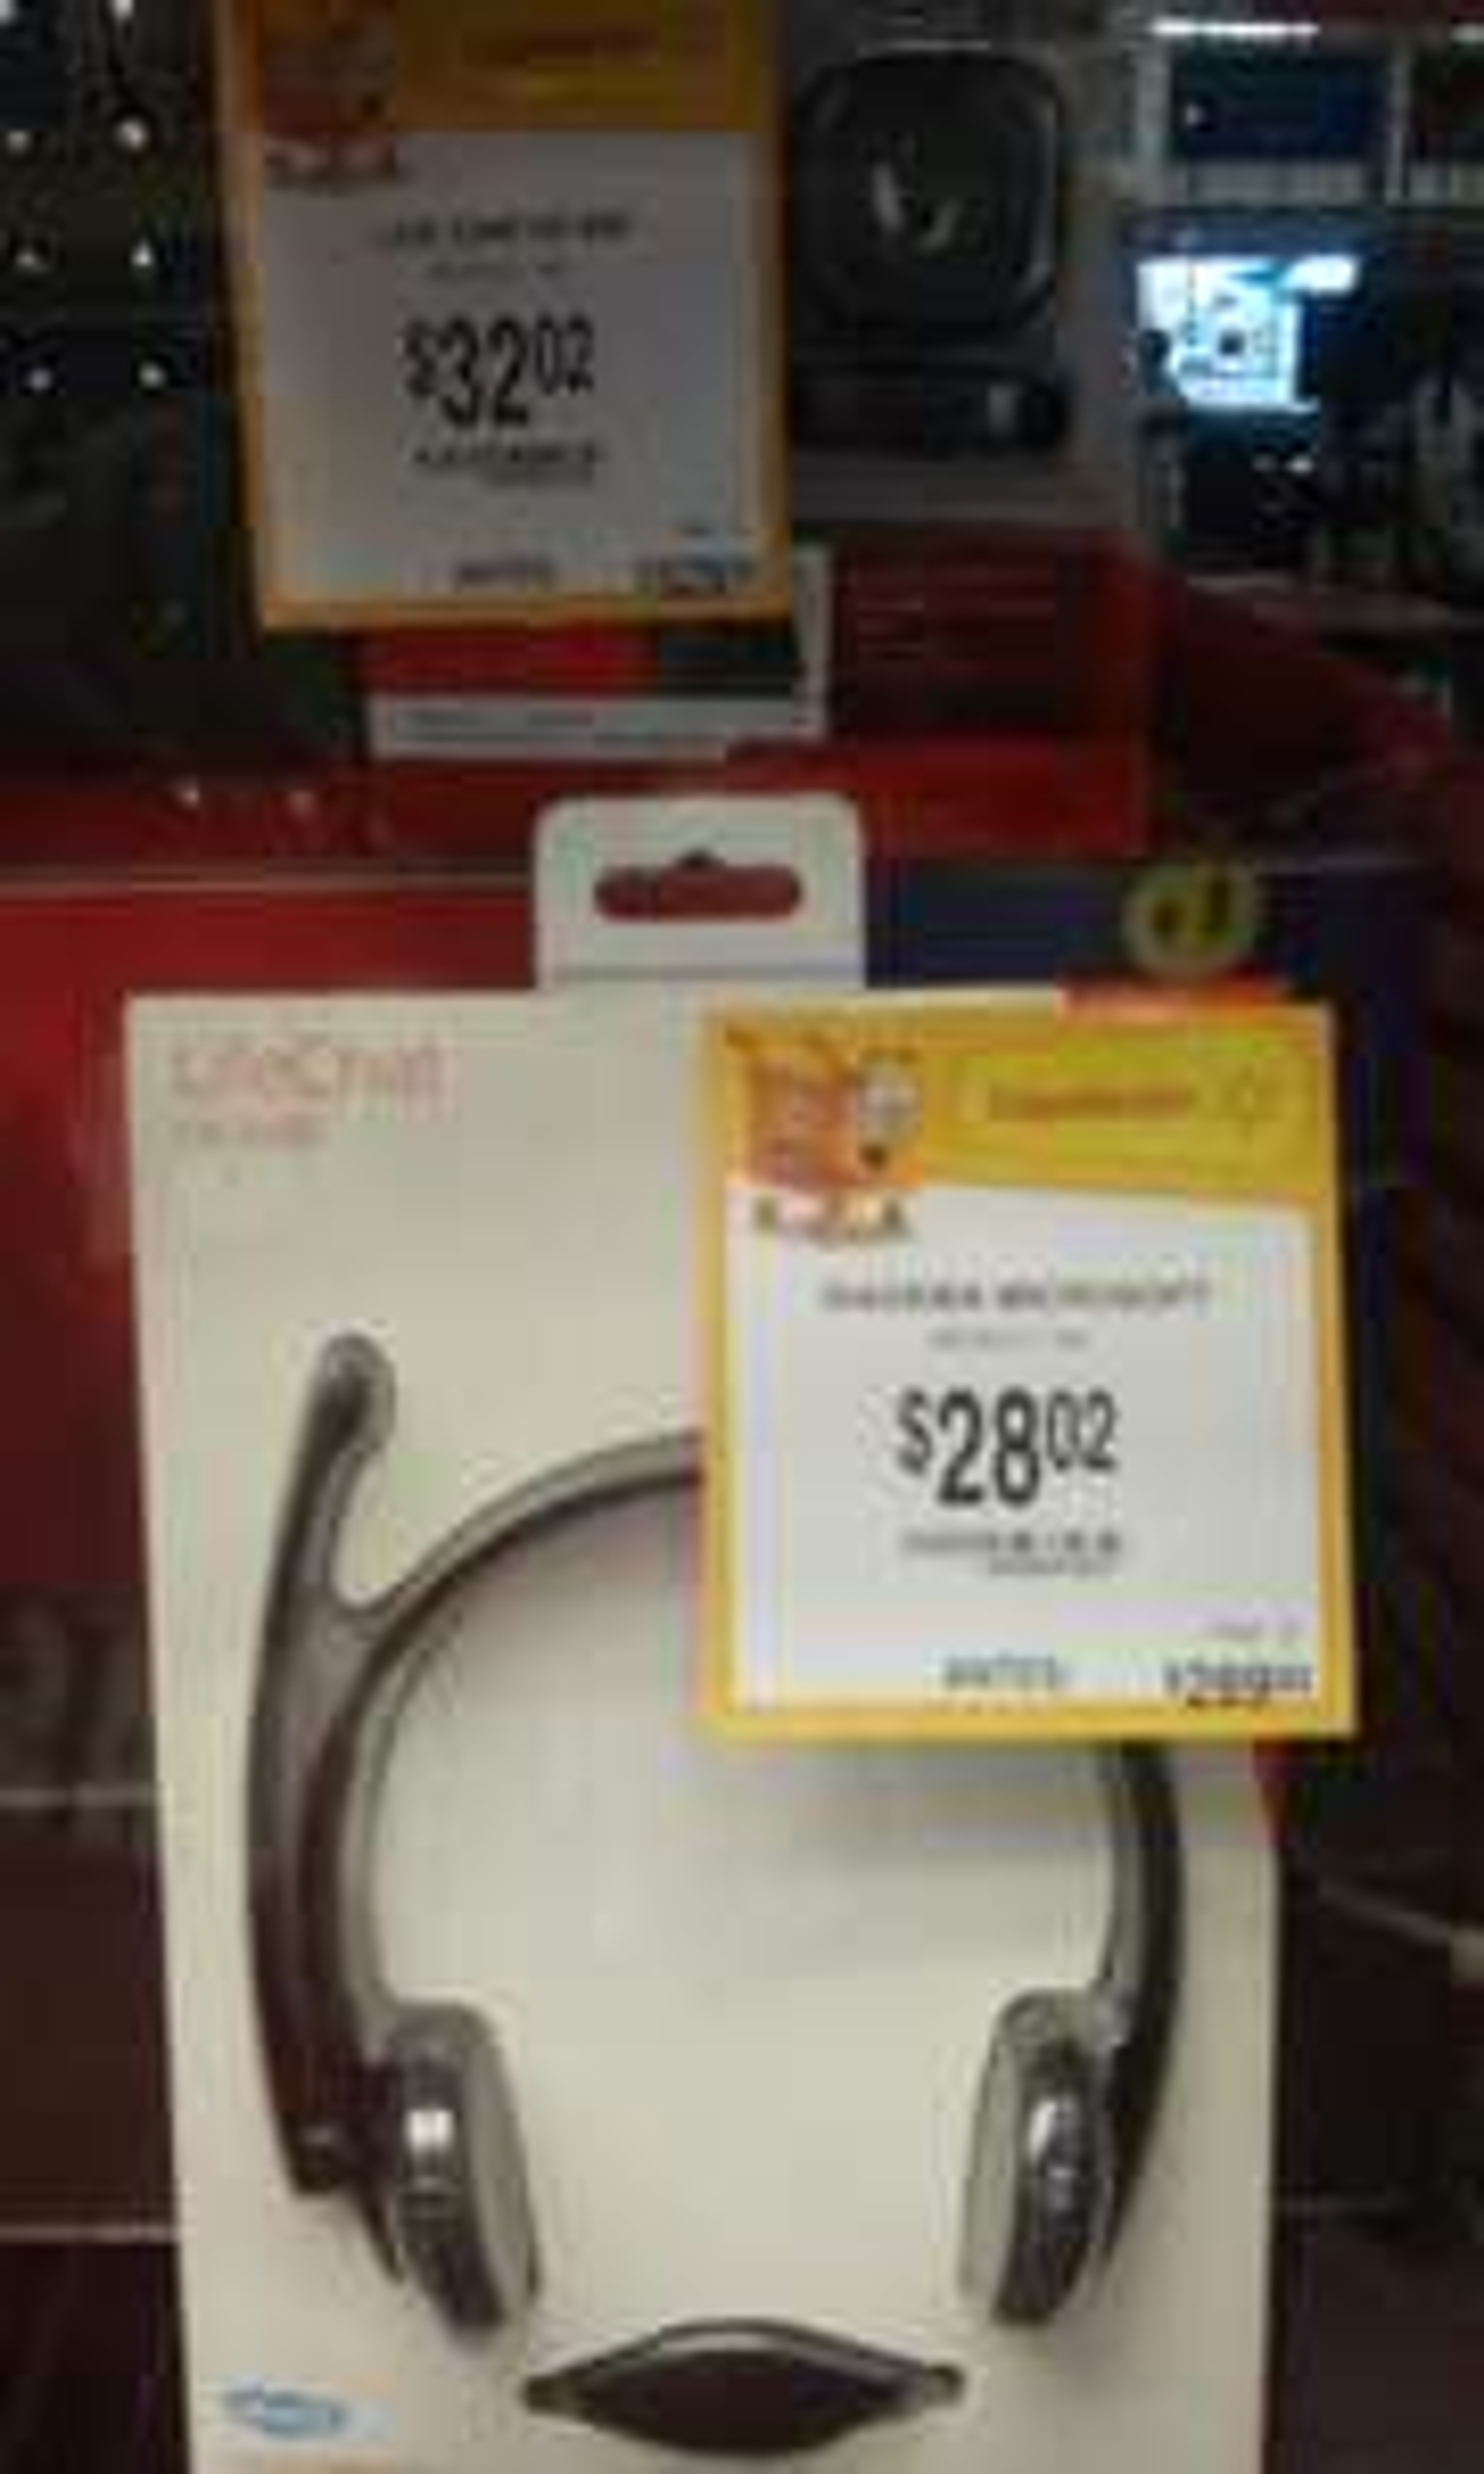 Walmart: Auriculares Livechat $28.02 y Web Cam Microsoft $32.02 (-90%)